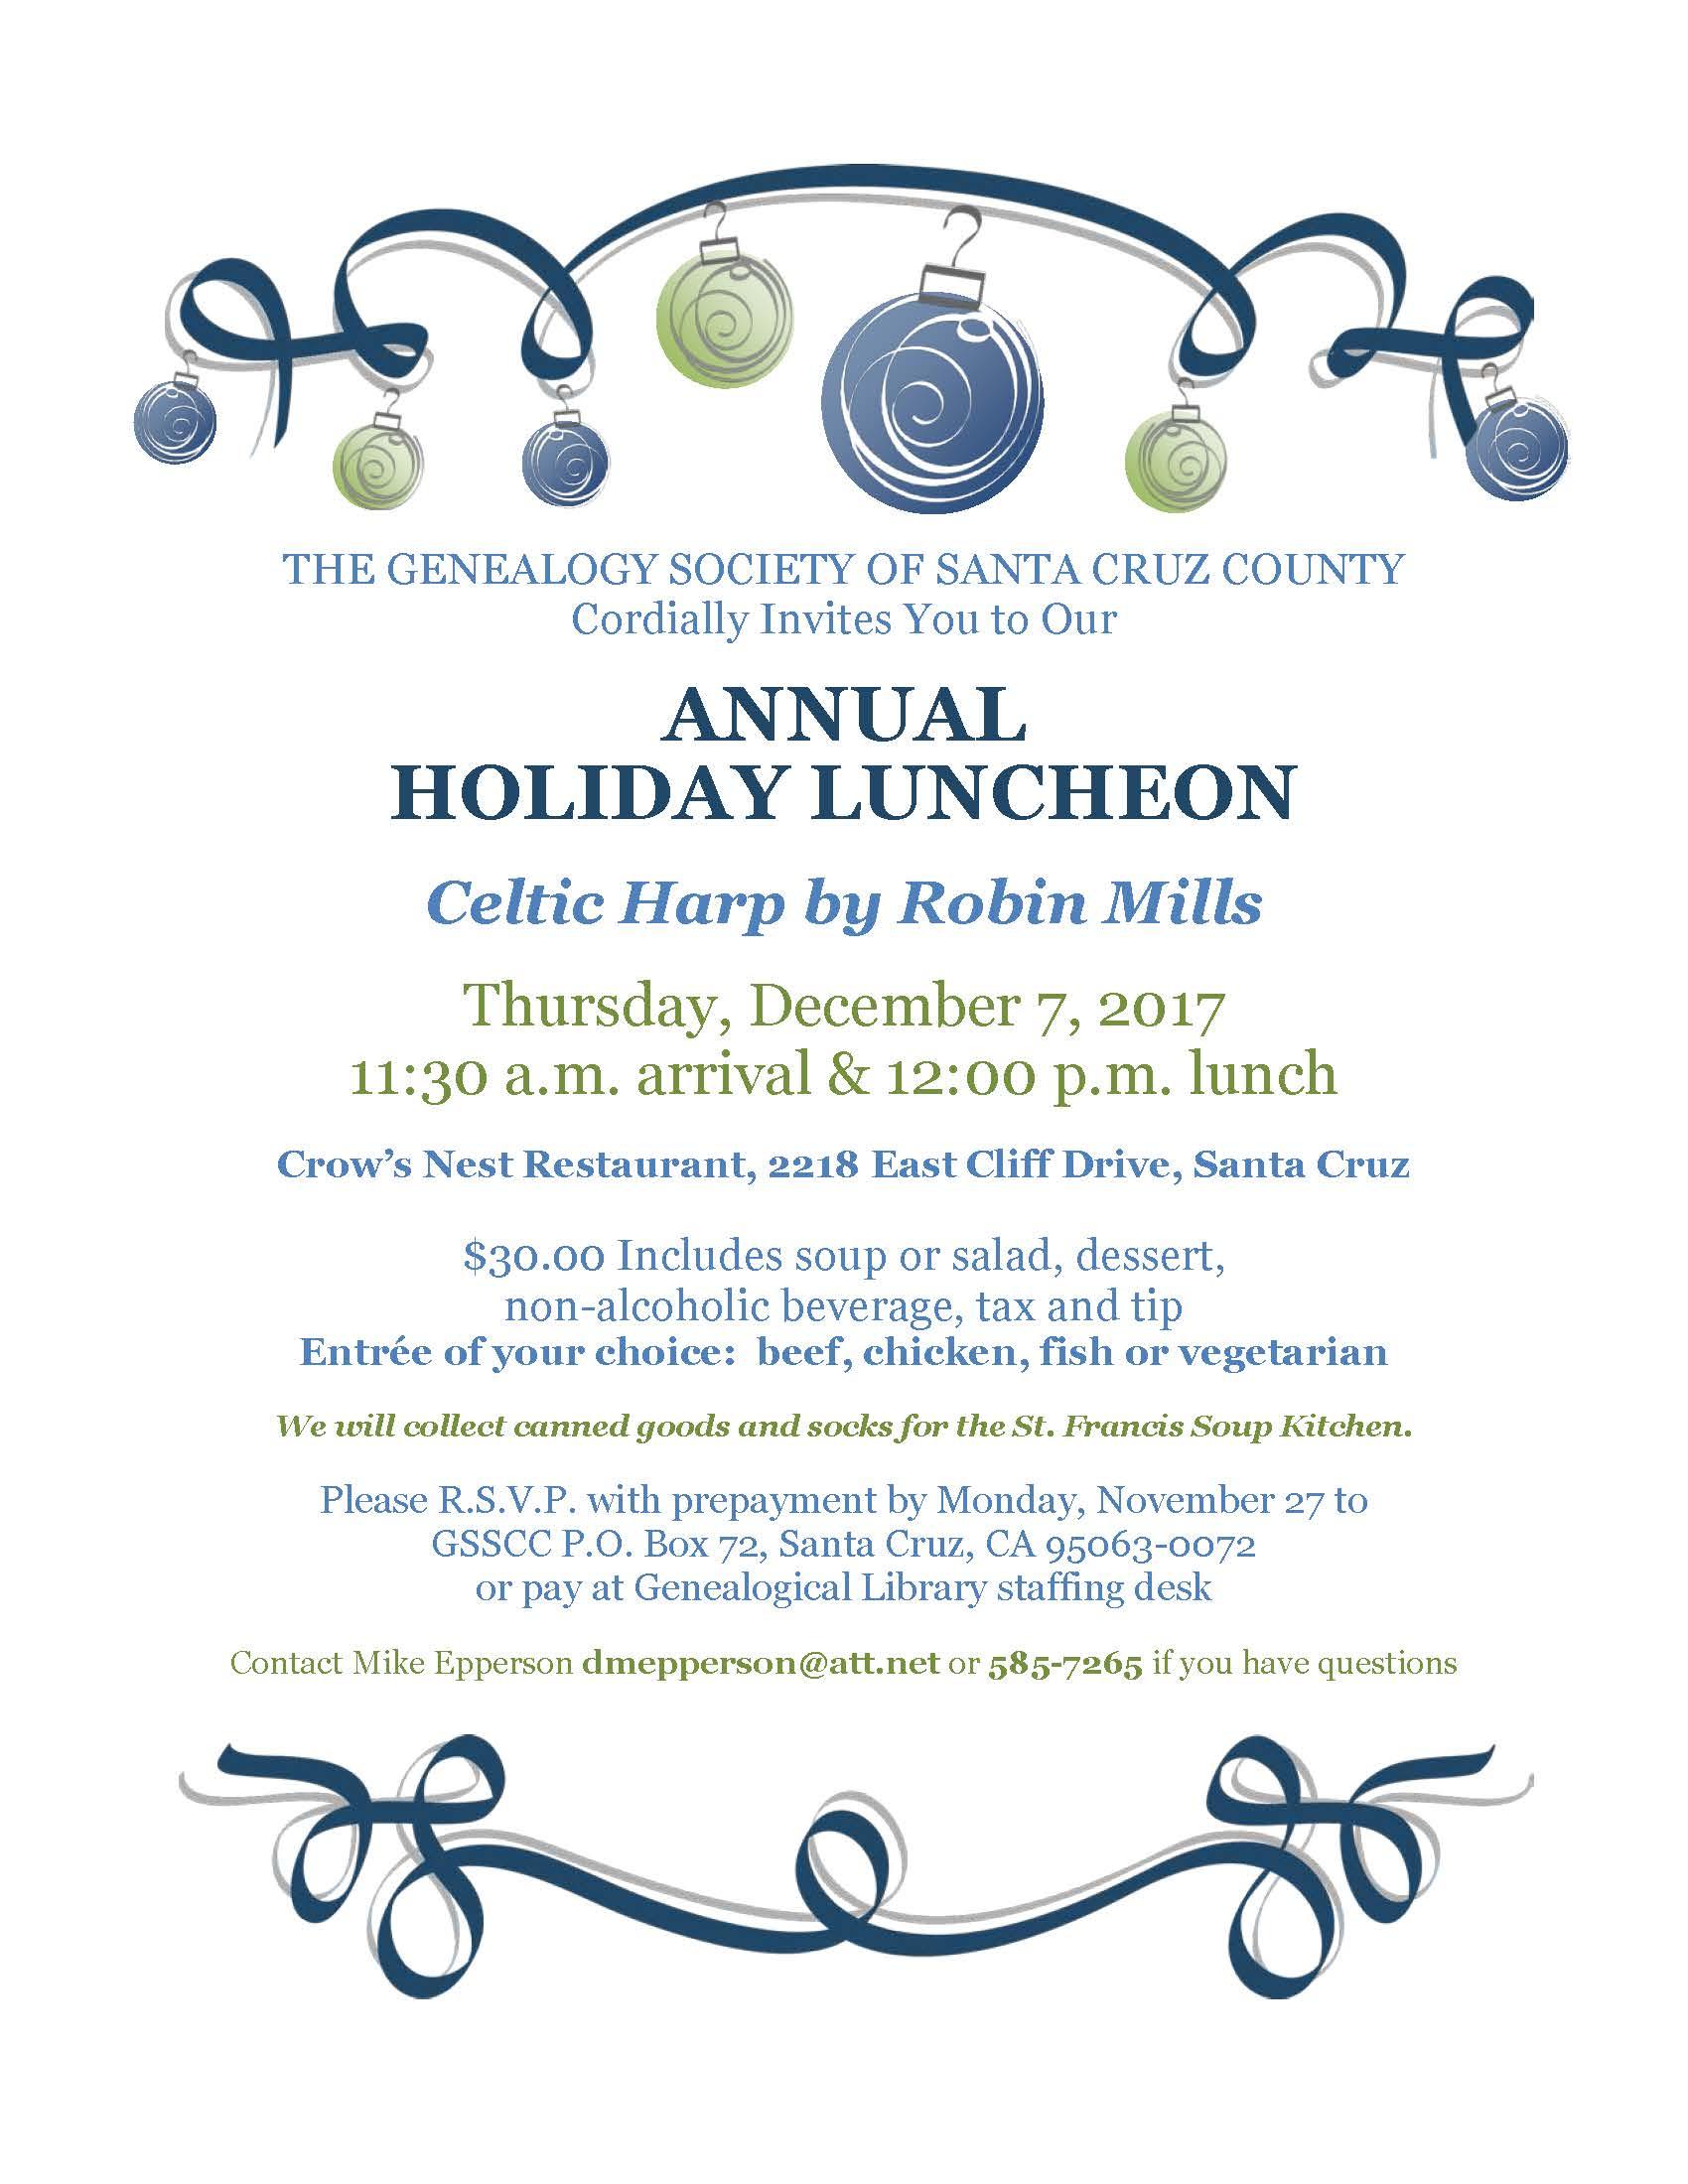 Annual Holiday Luncheon - Genealogical Society of Santa Cruz County